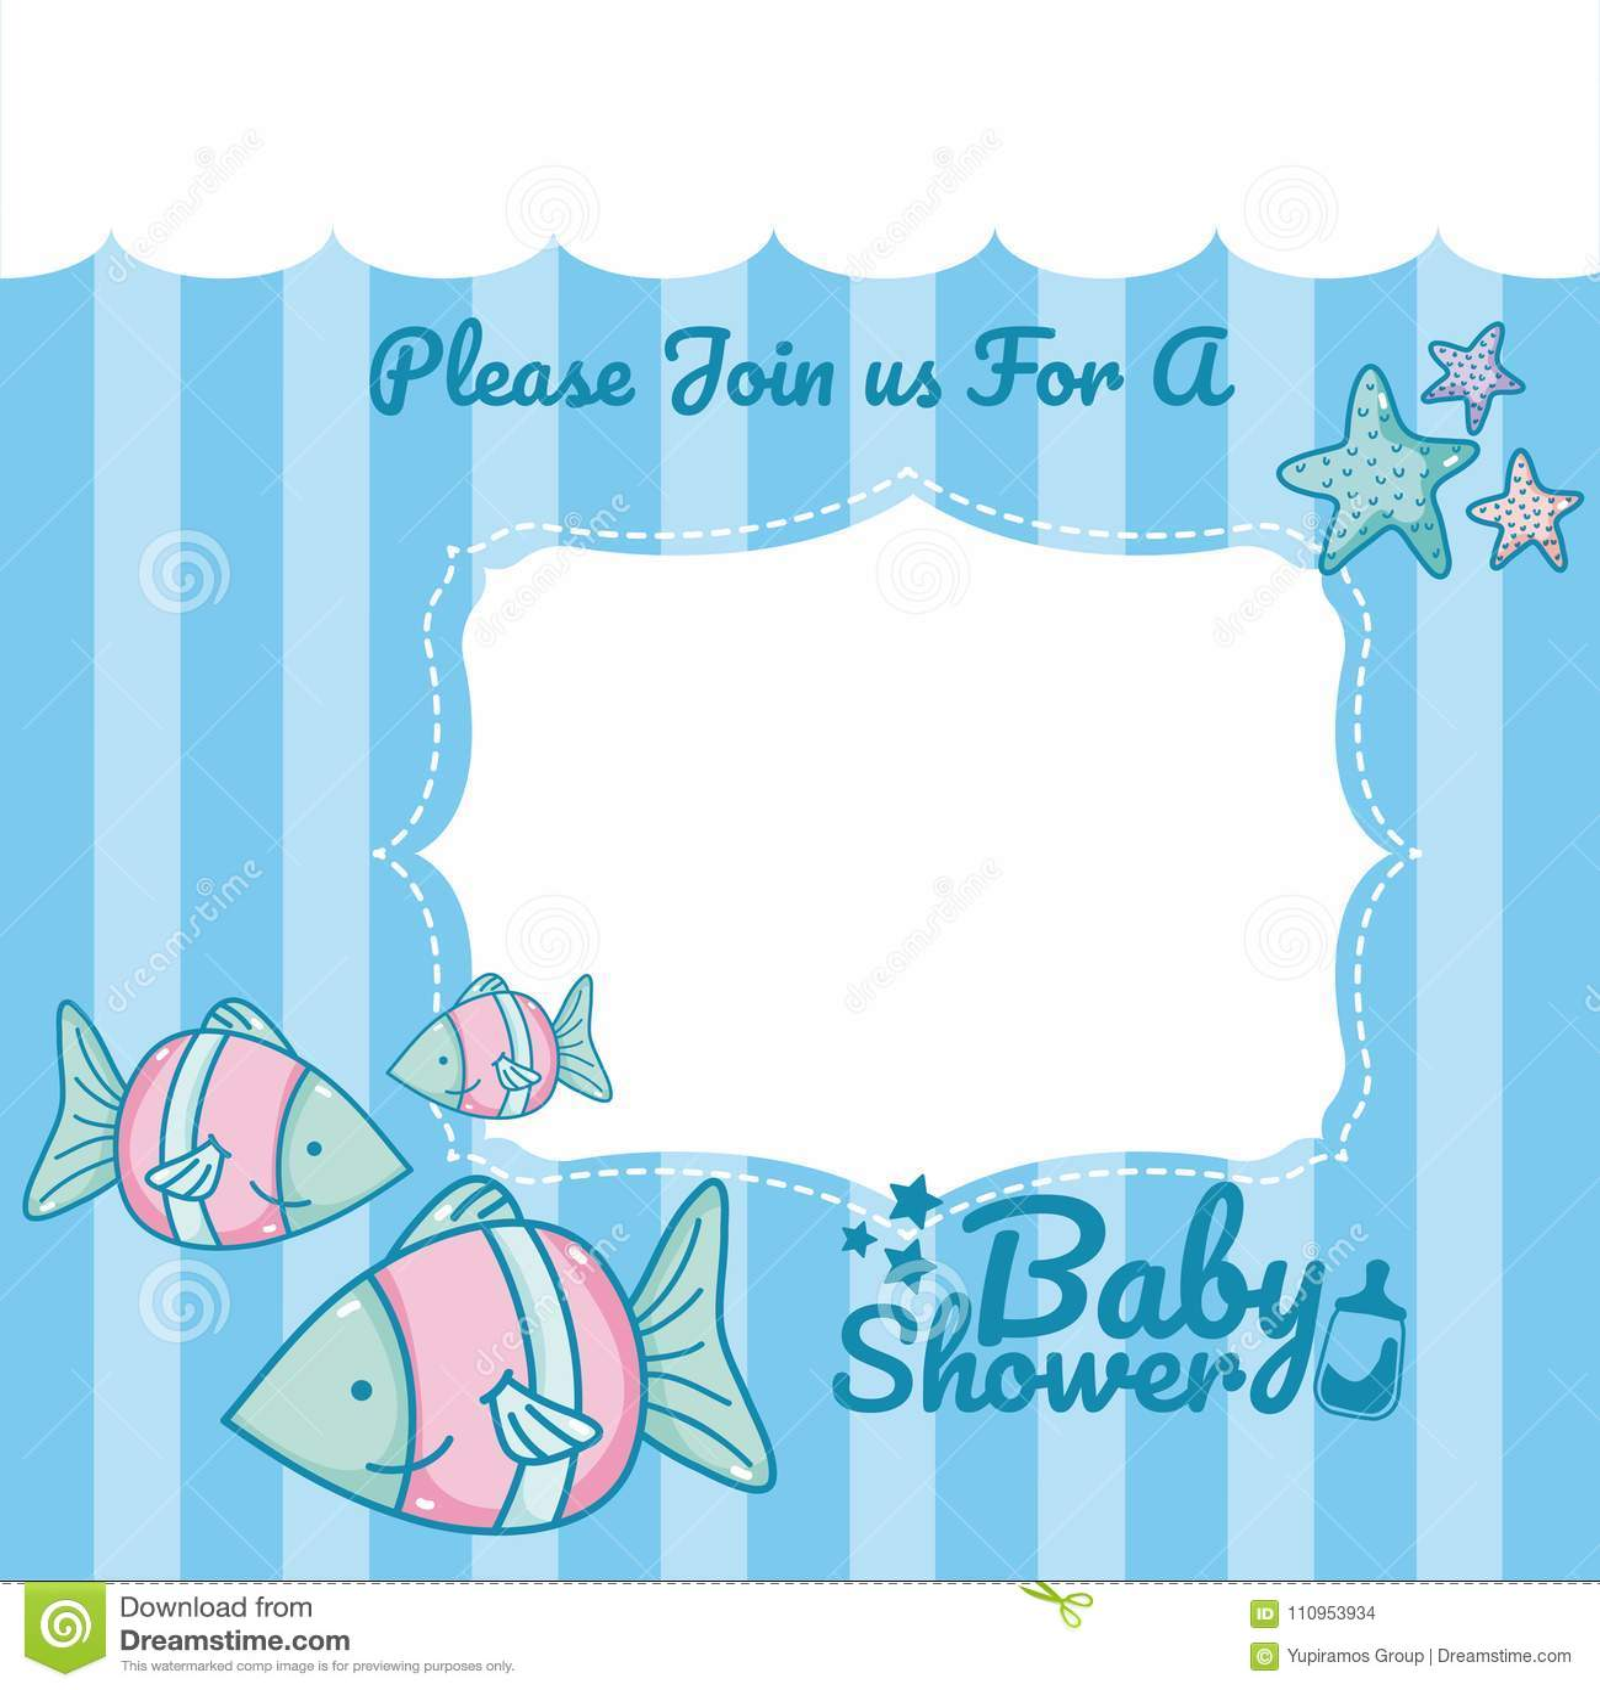 Baby Shower Invitation Card Stock Vector Illustration Of